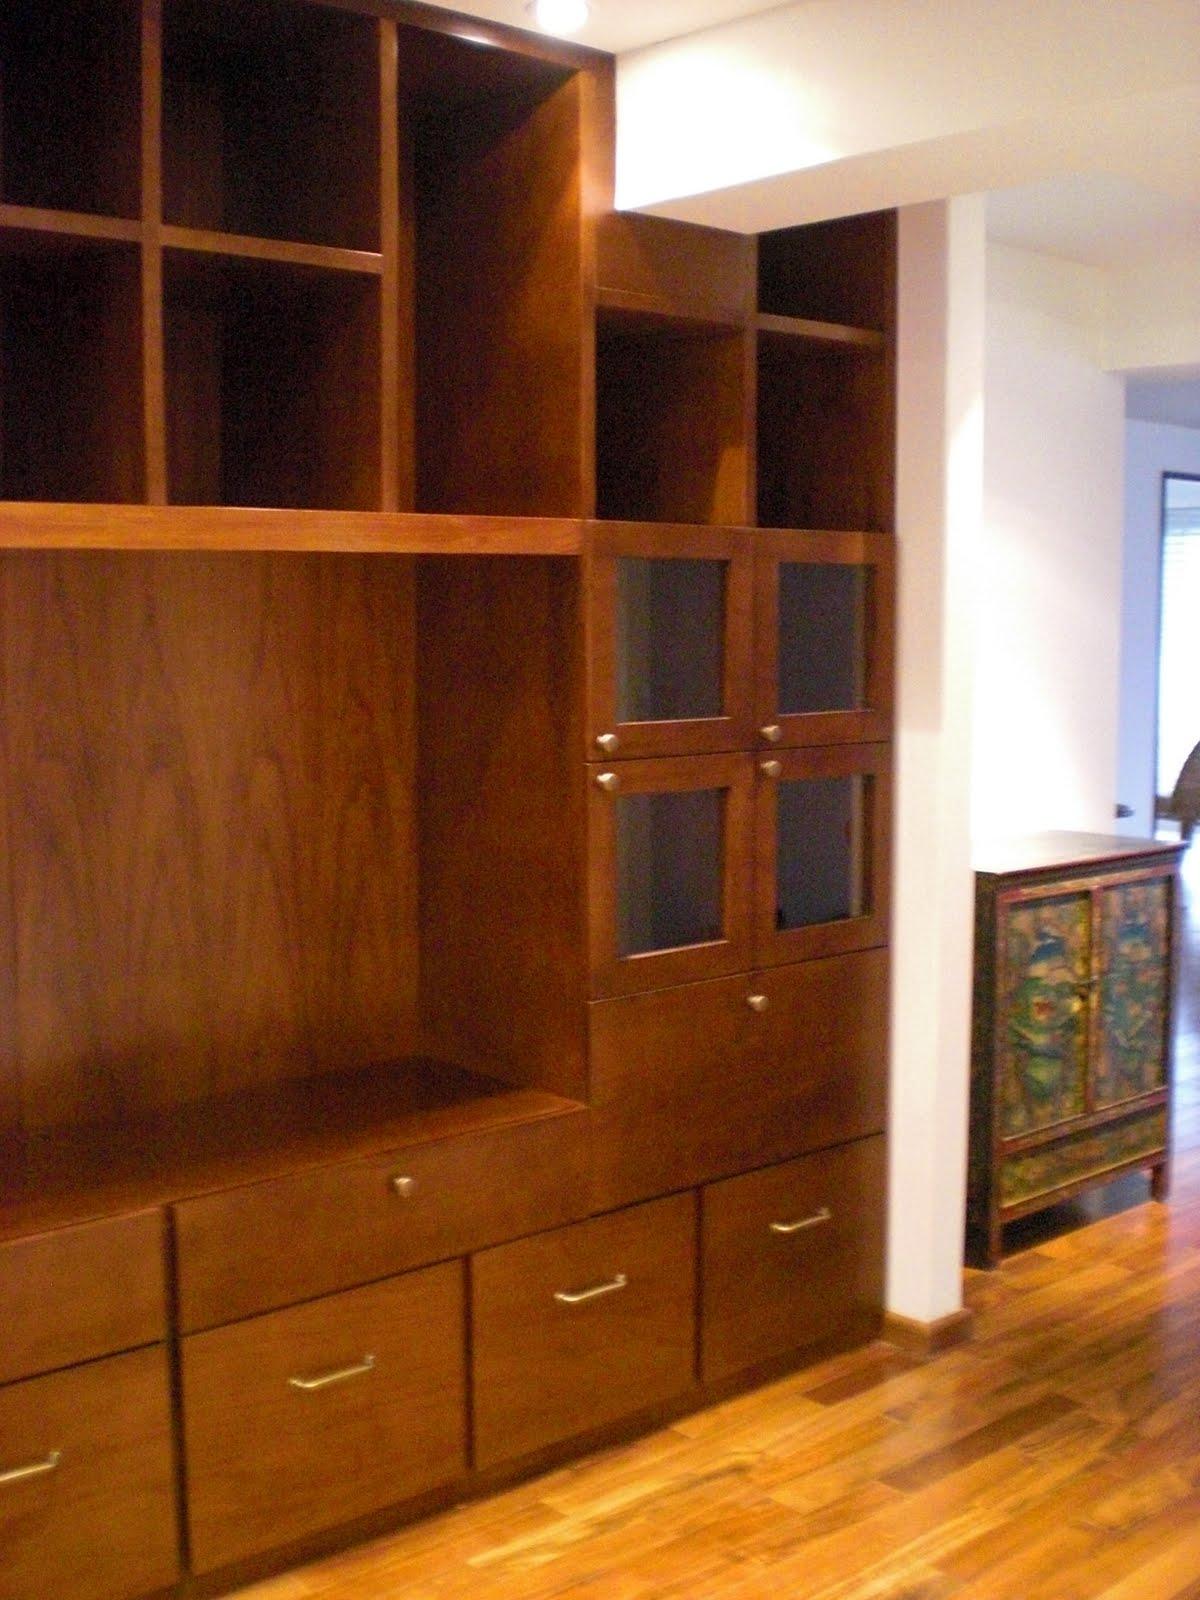 Muebles sobre dise o avl muebles para t v for Muebles para tv en madera